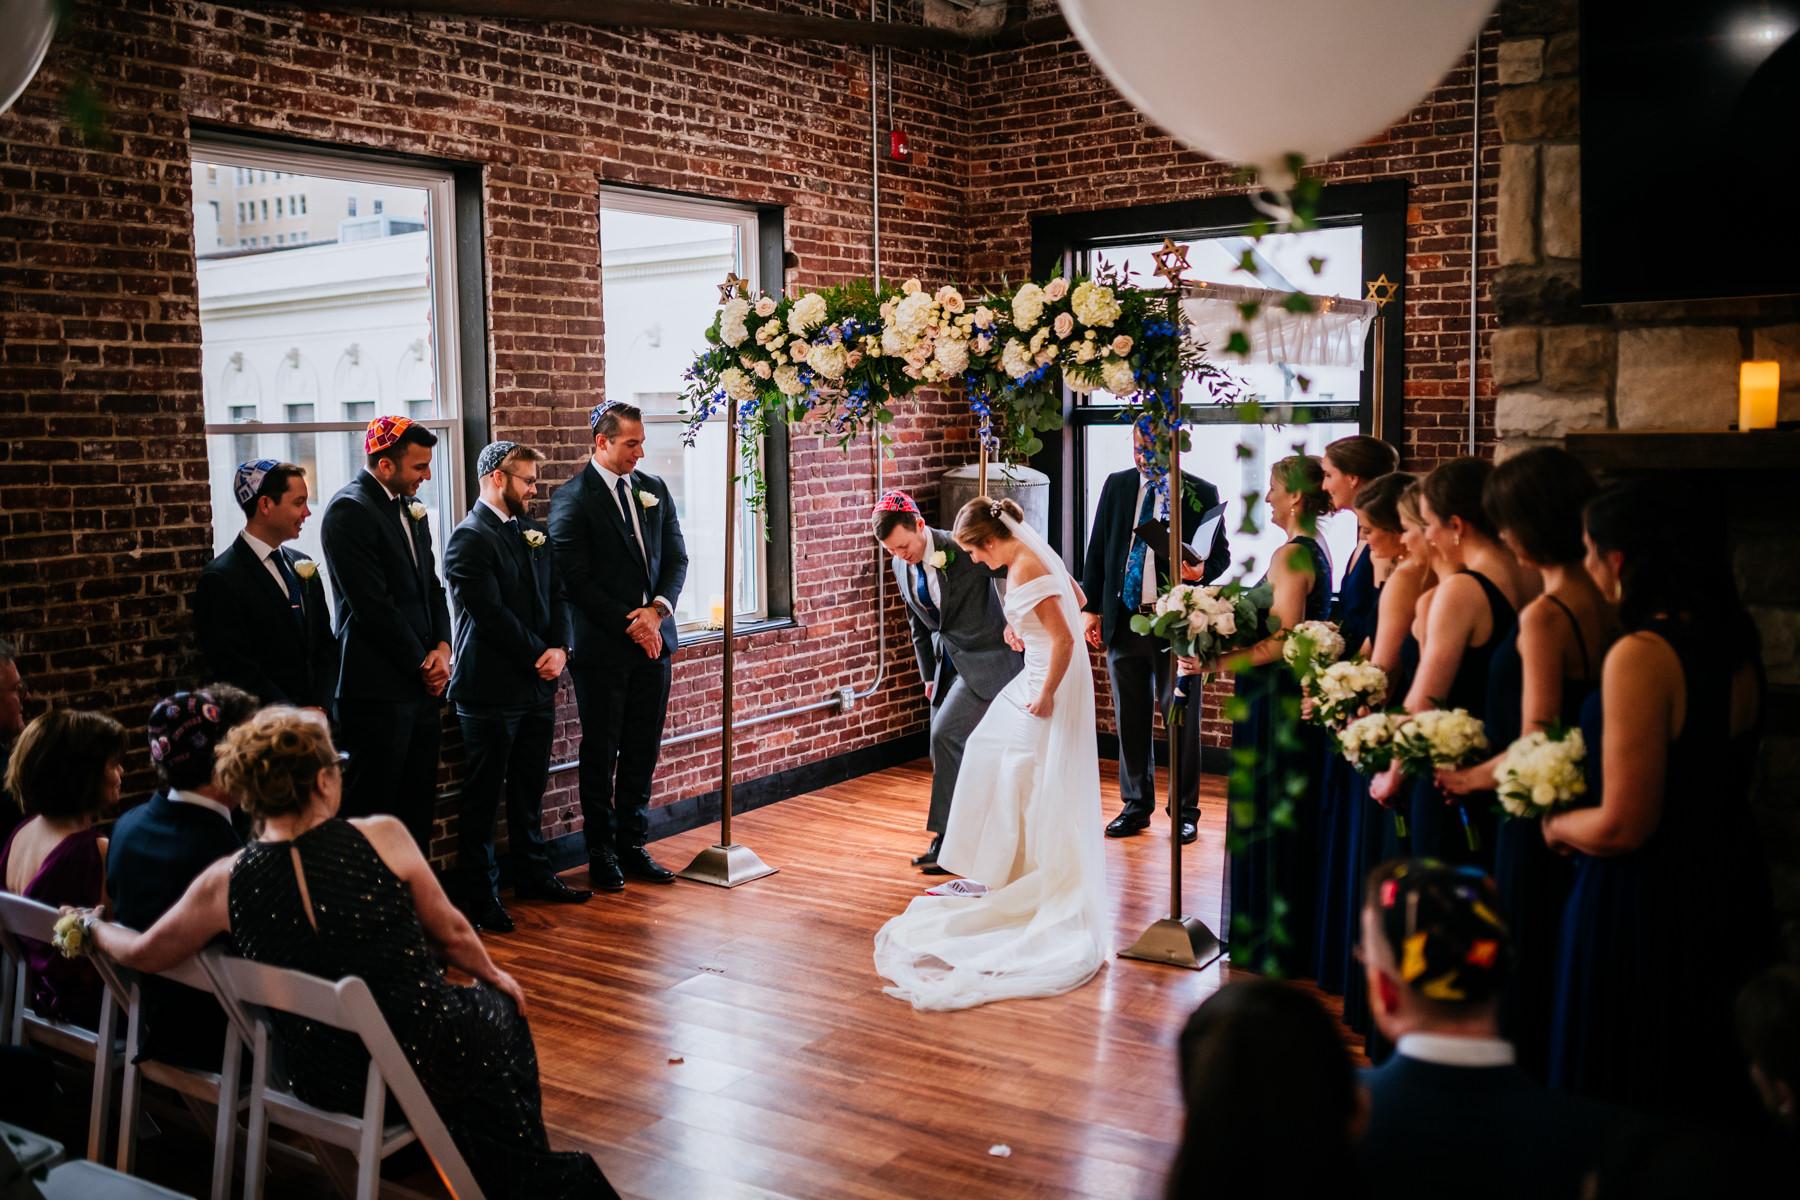 hale street center wedding glass breaking